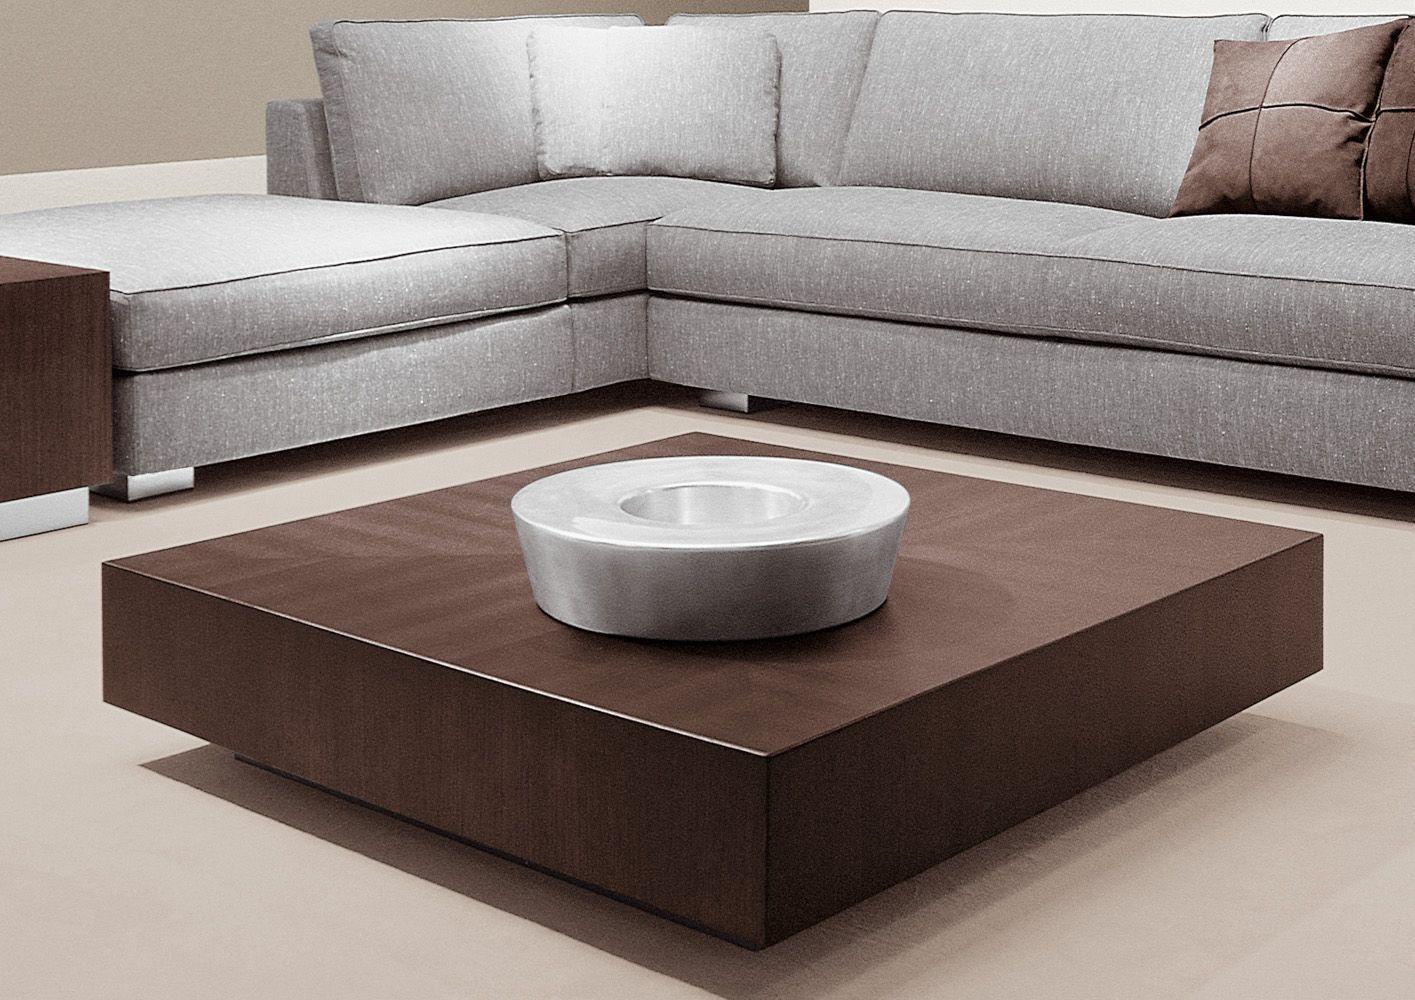 Minotti Albers Side Table Archicad Ka Kaa Furniture In